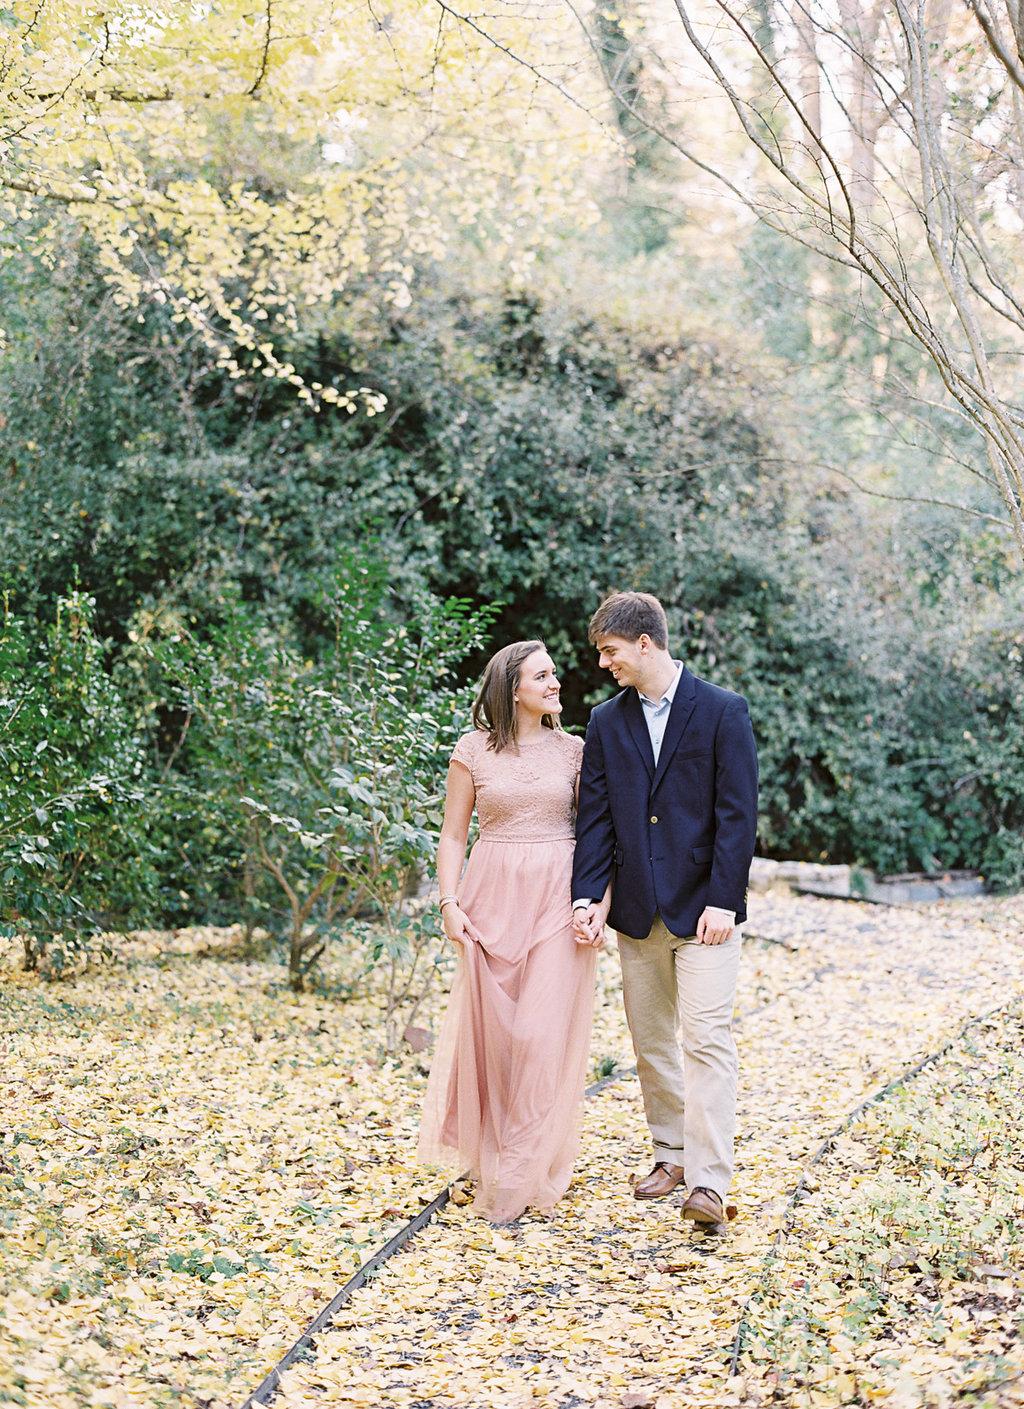 Cator-woolford-gardens-wedding-photography-hannah-forsberg-atlanta-17.jpg